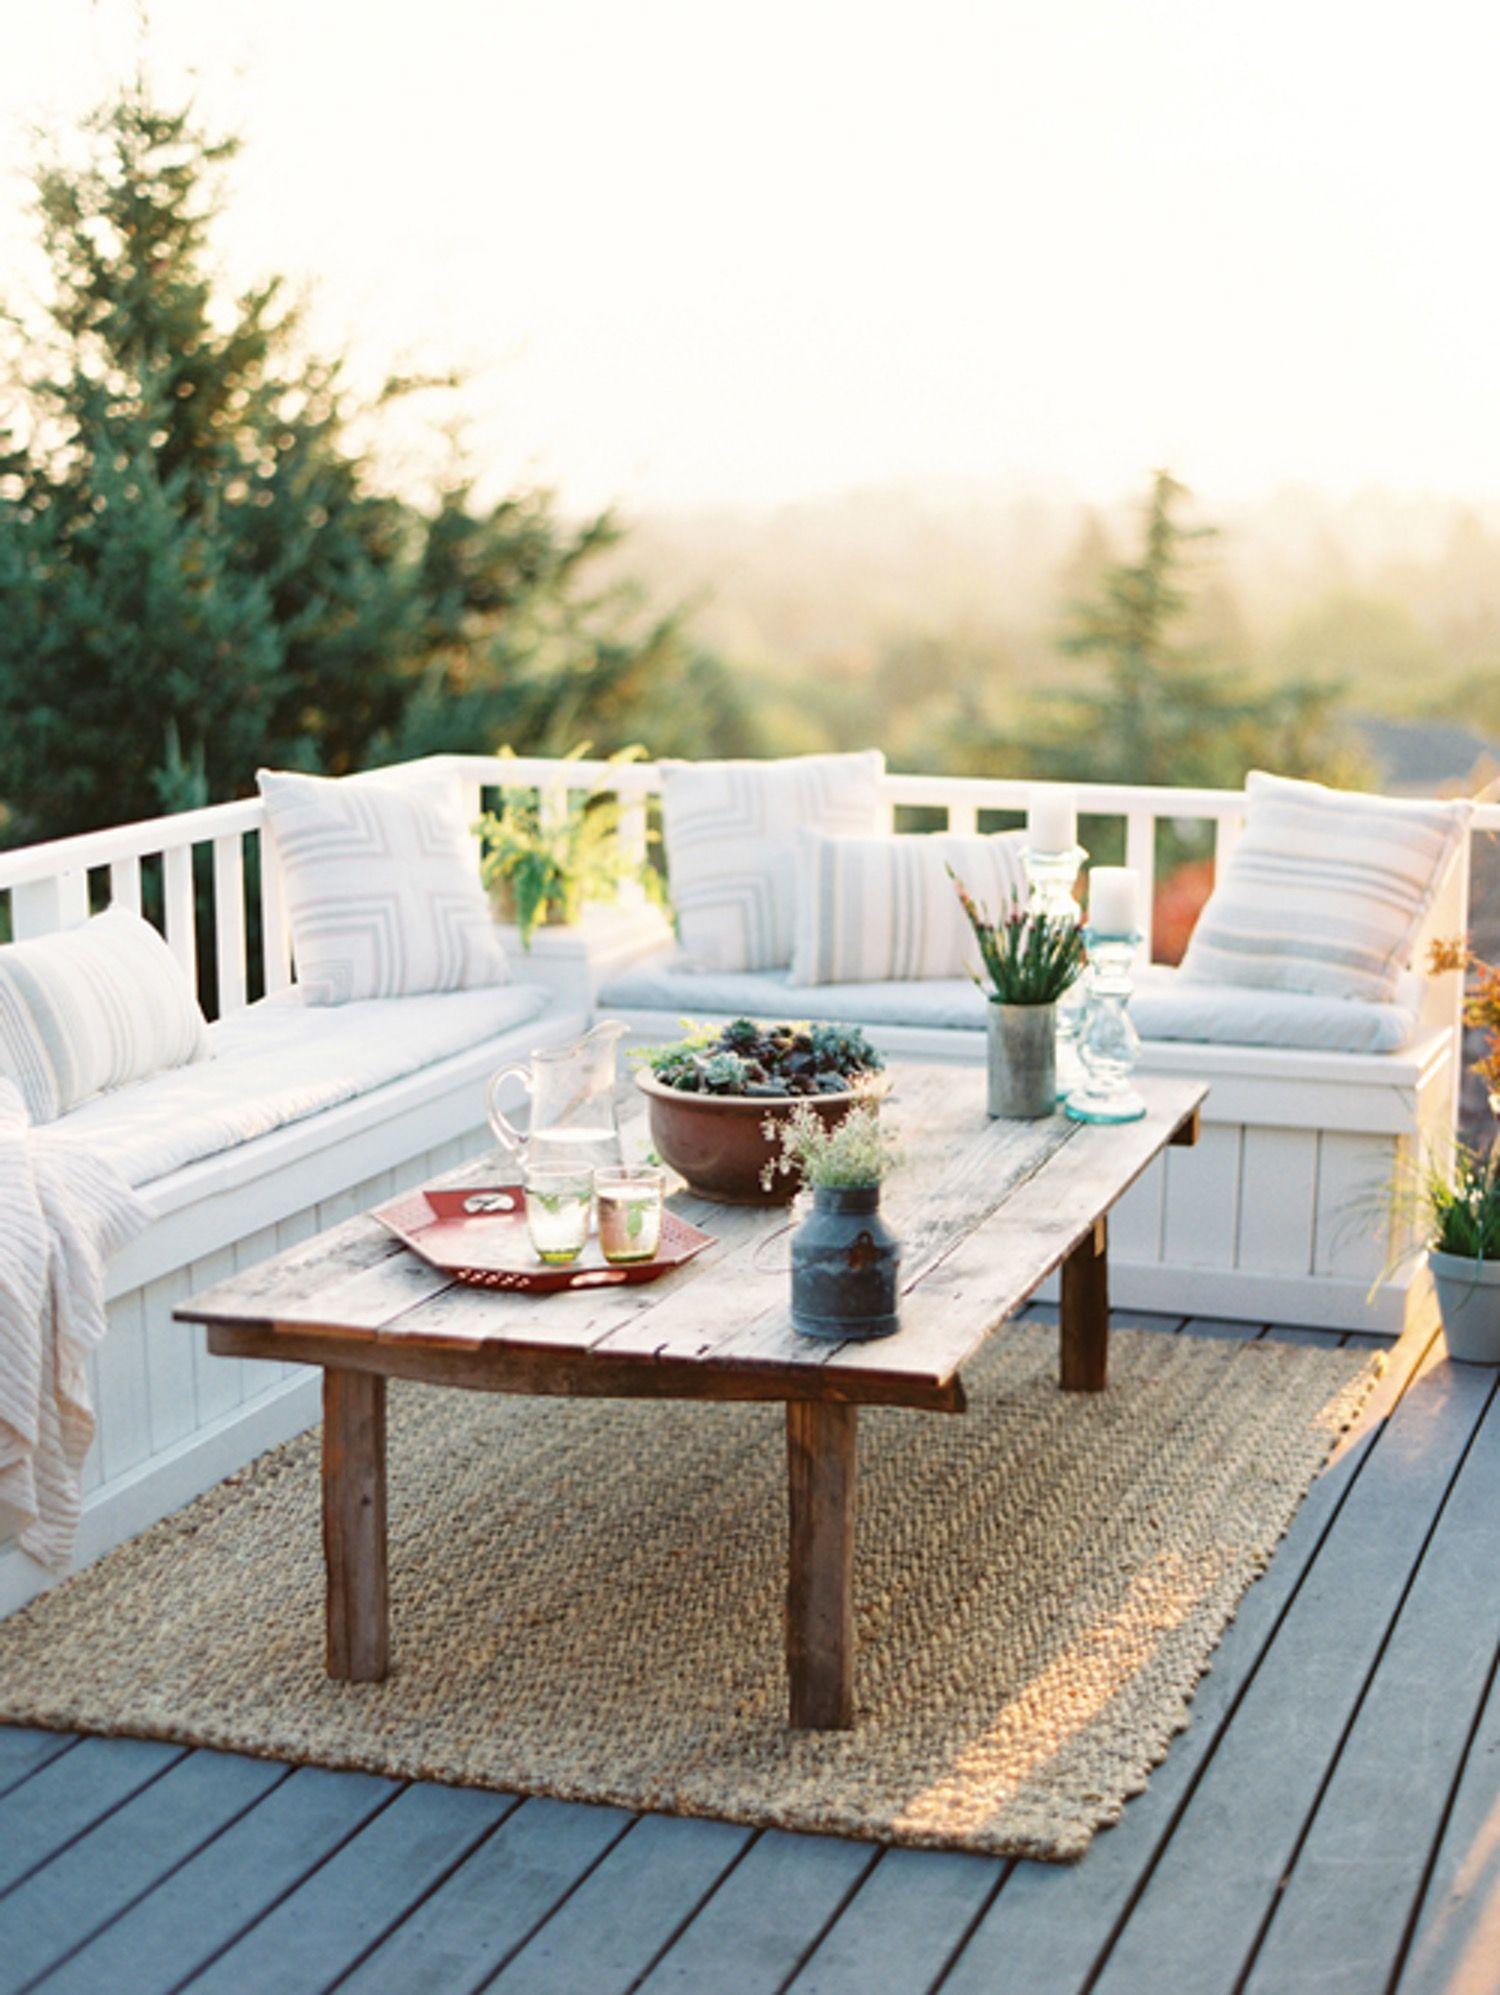 outdoor dining escapes inspiring decks furniture ideas spoolers rh pinterest com au